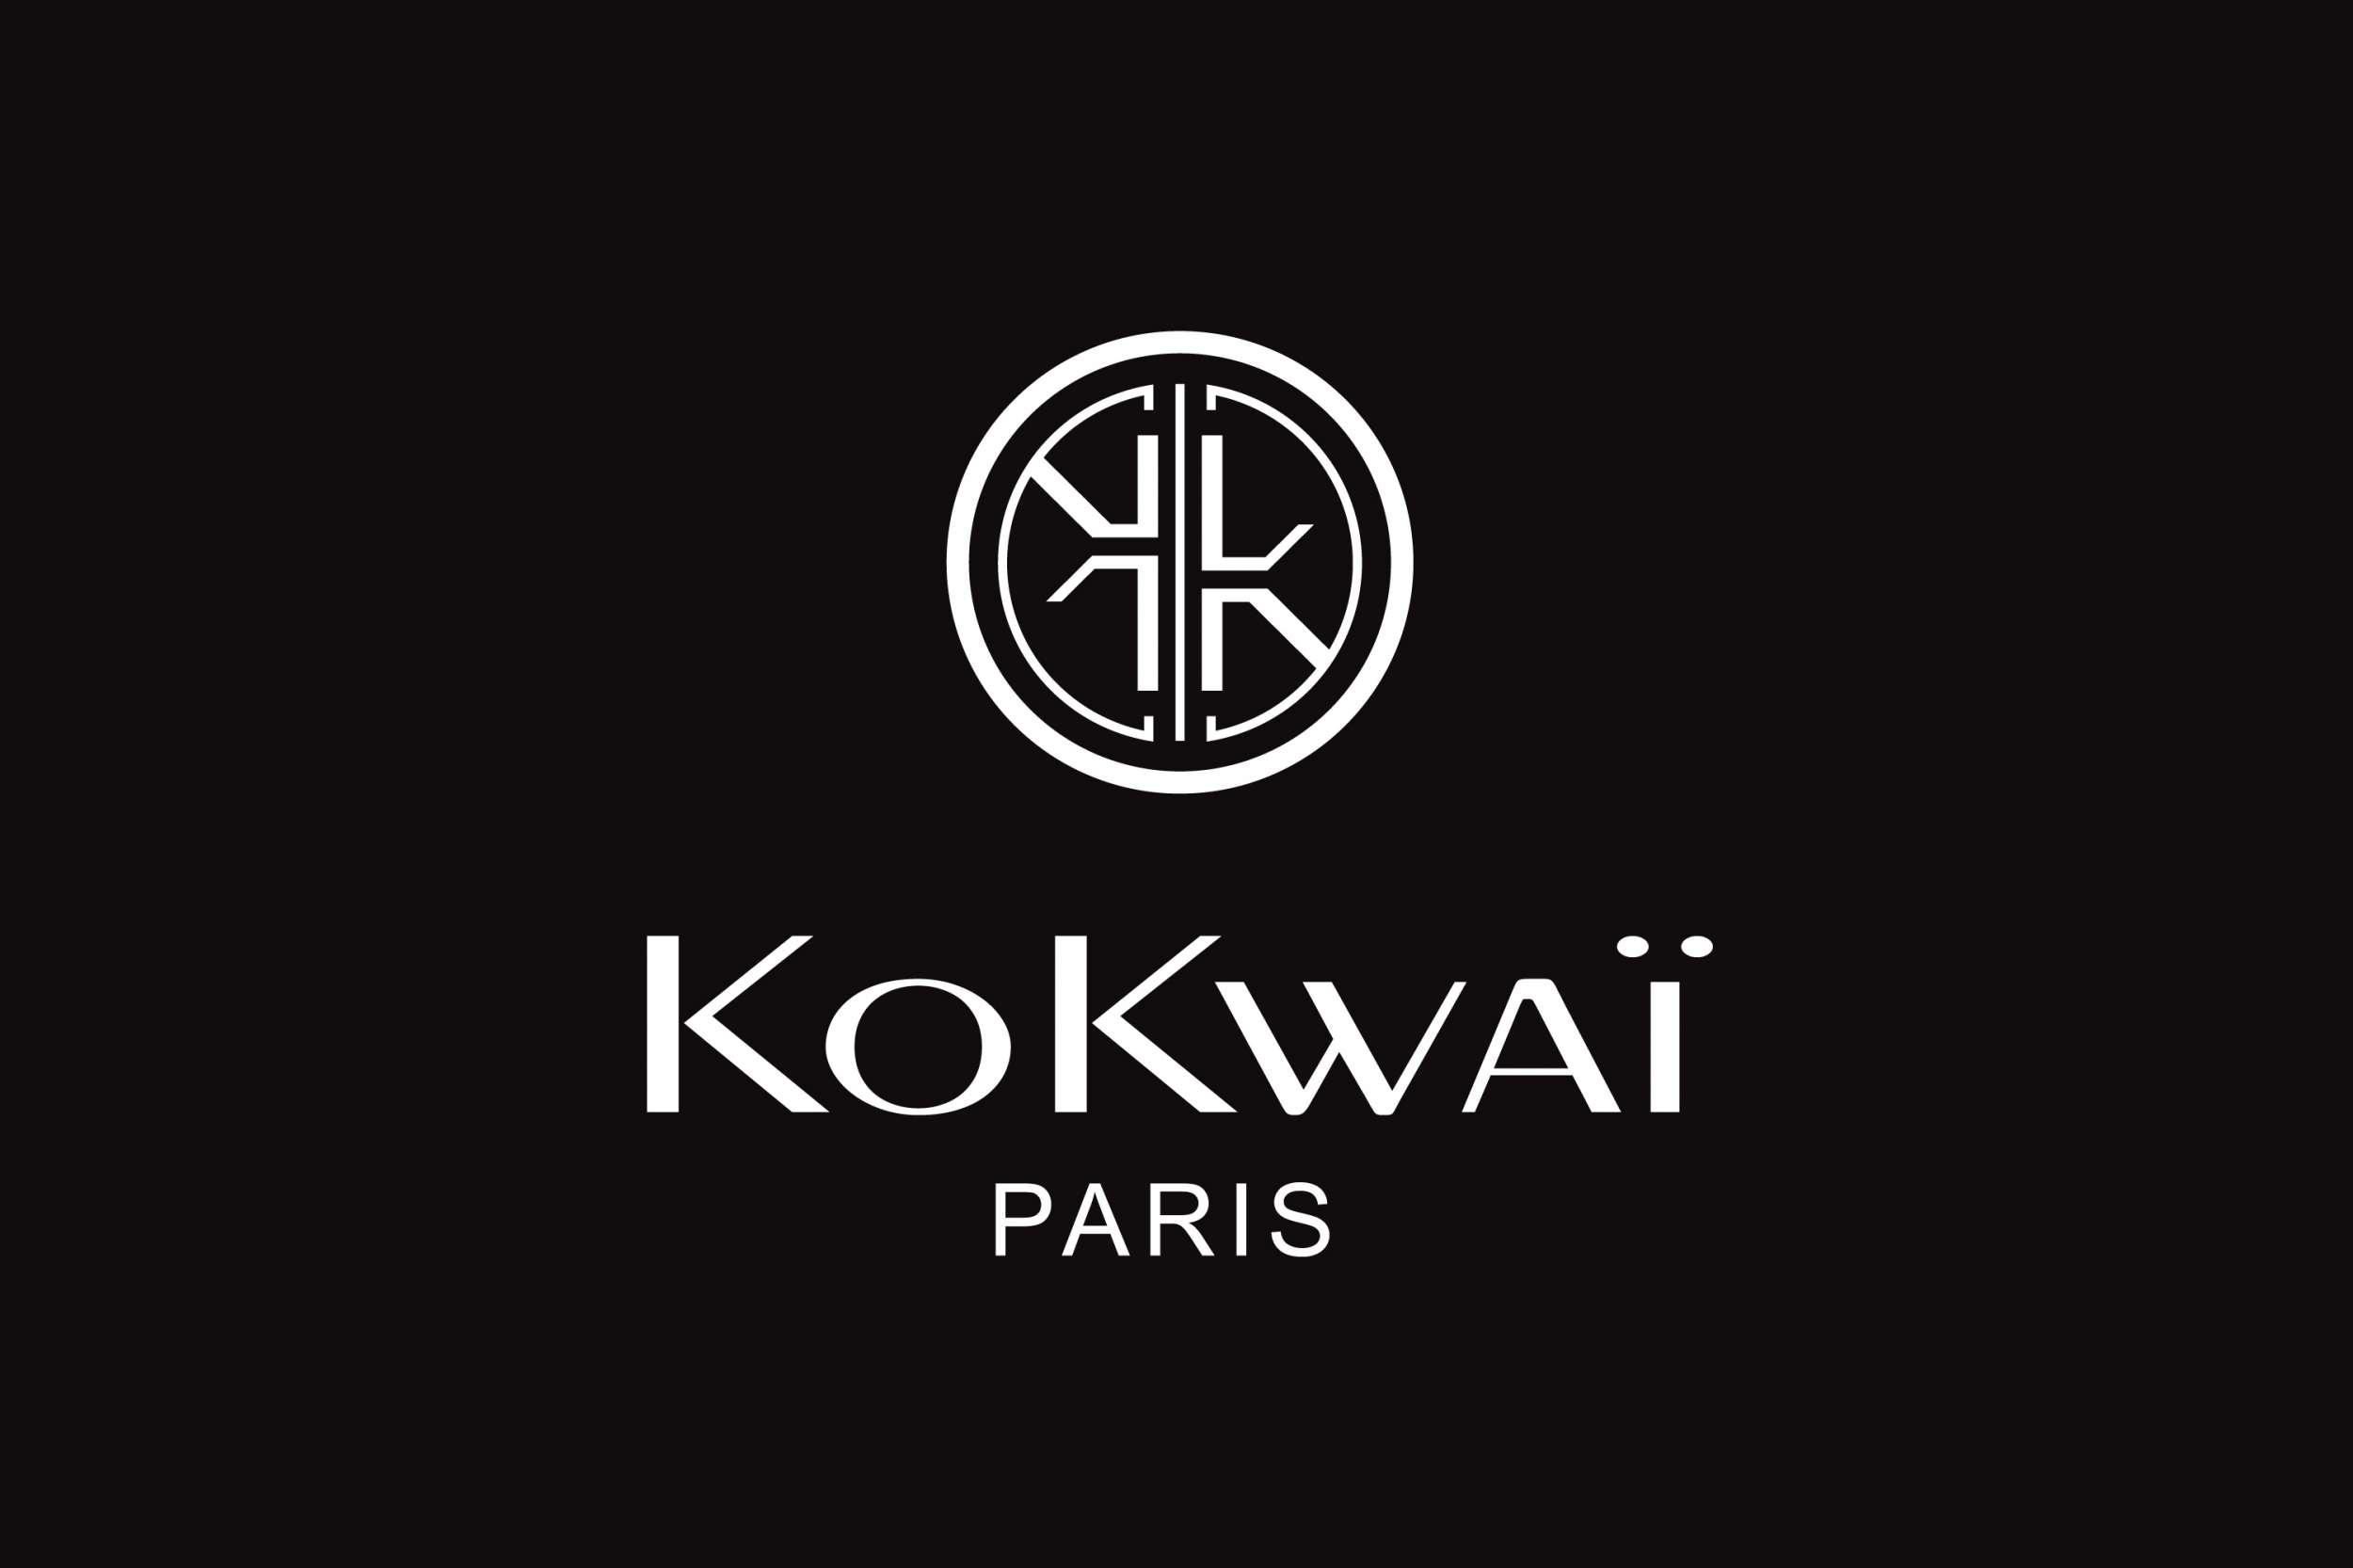 Kokwaï